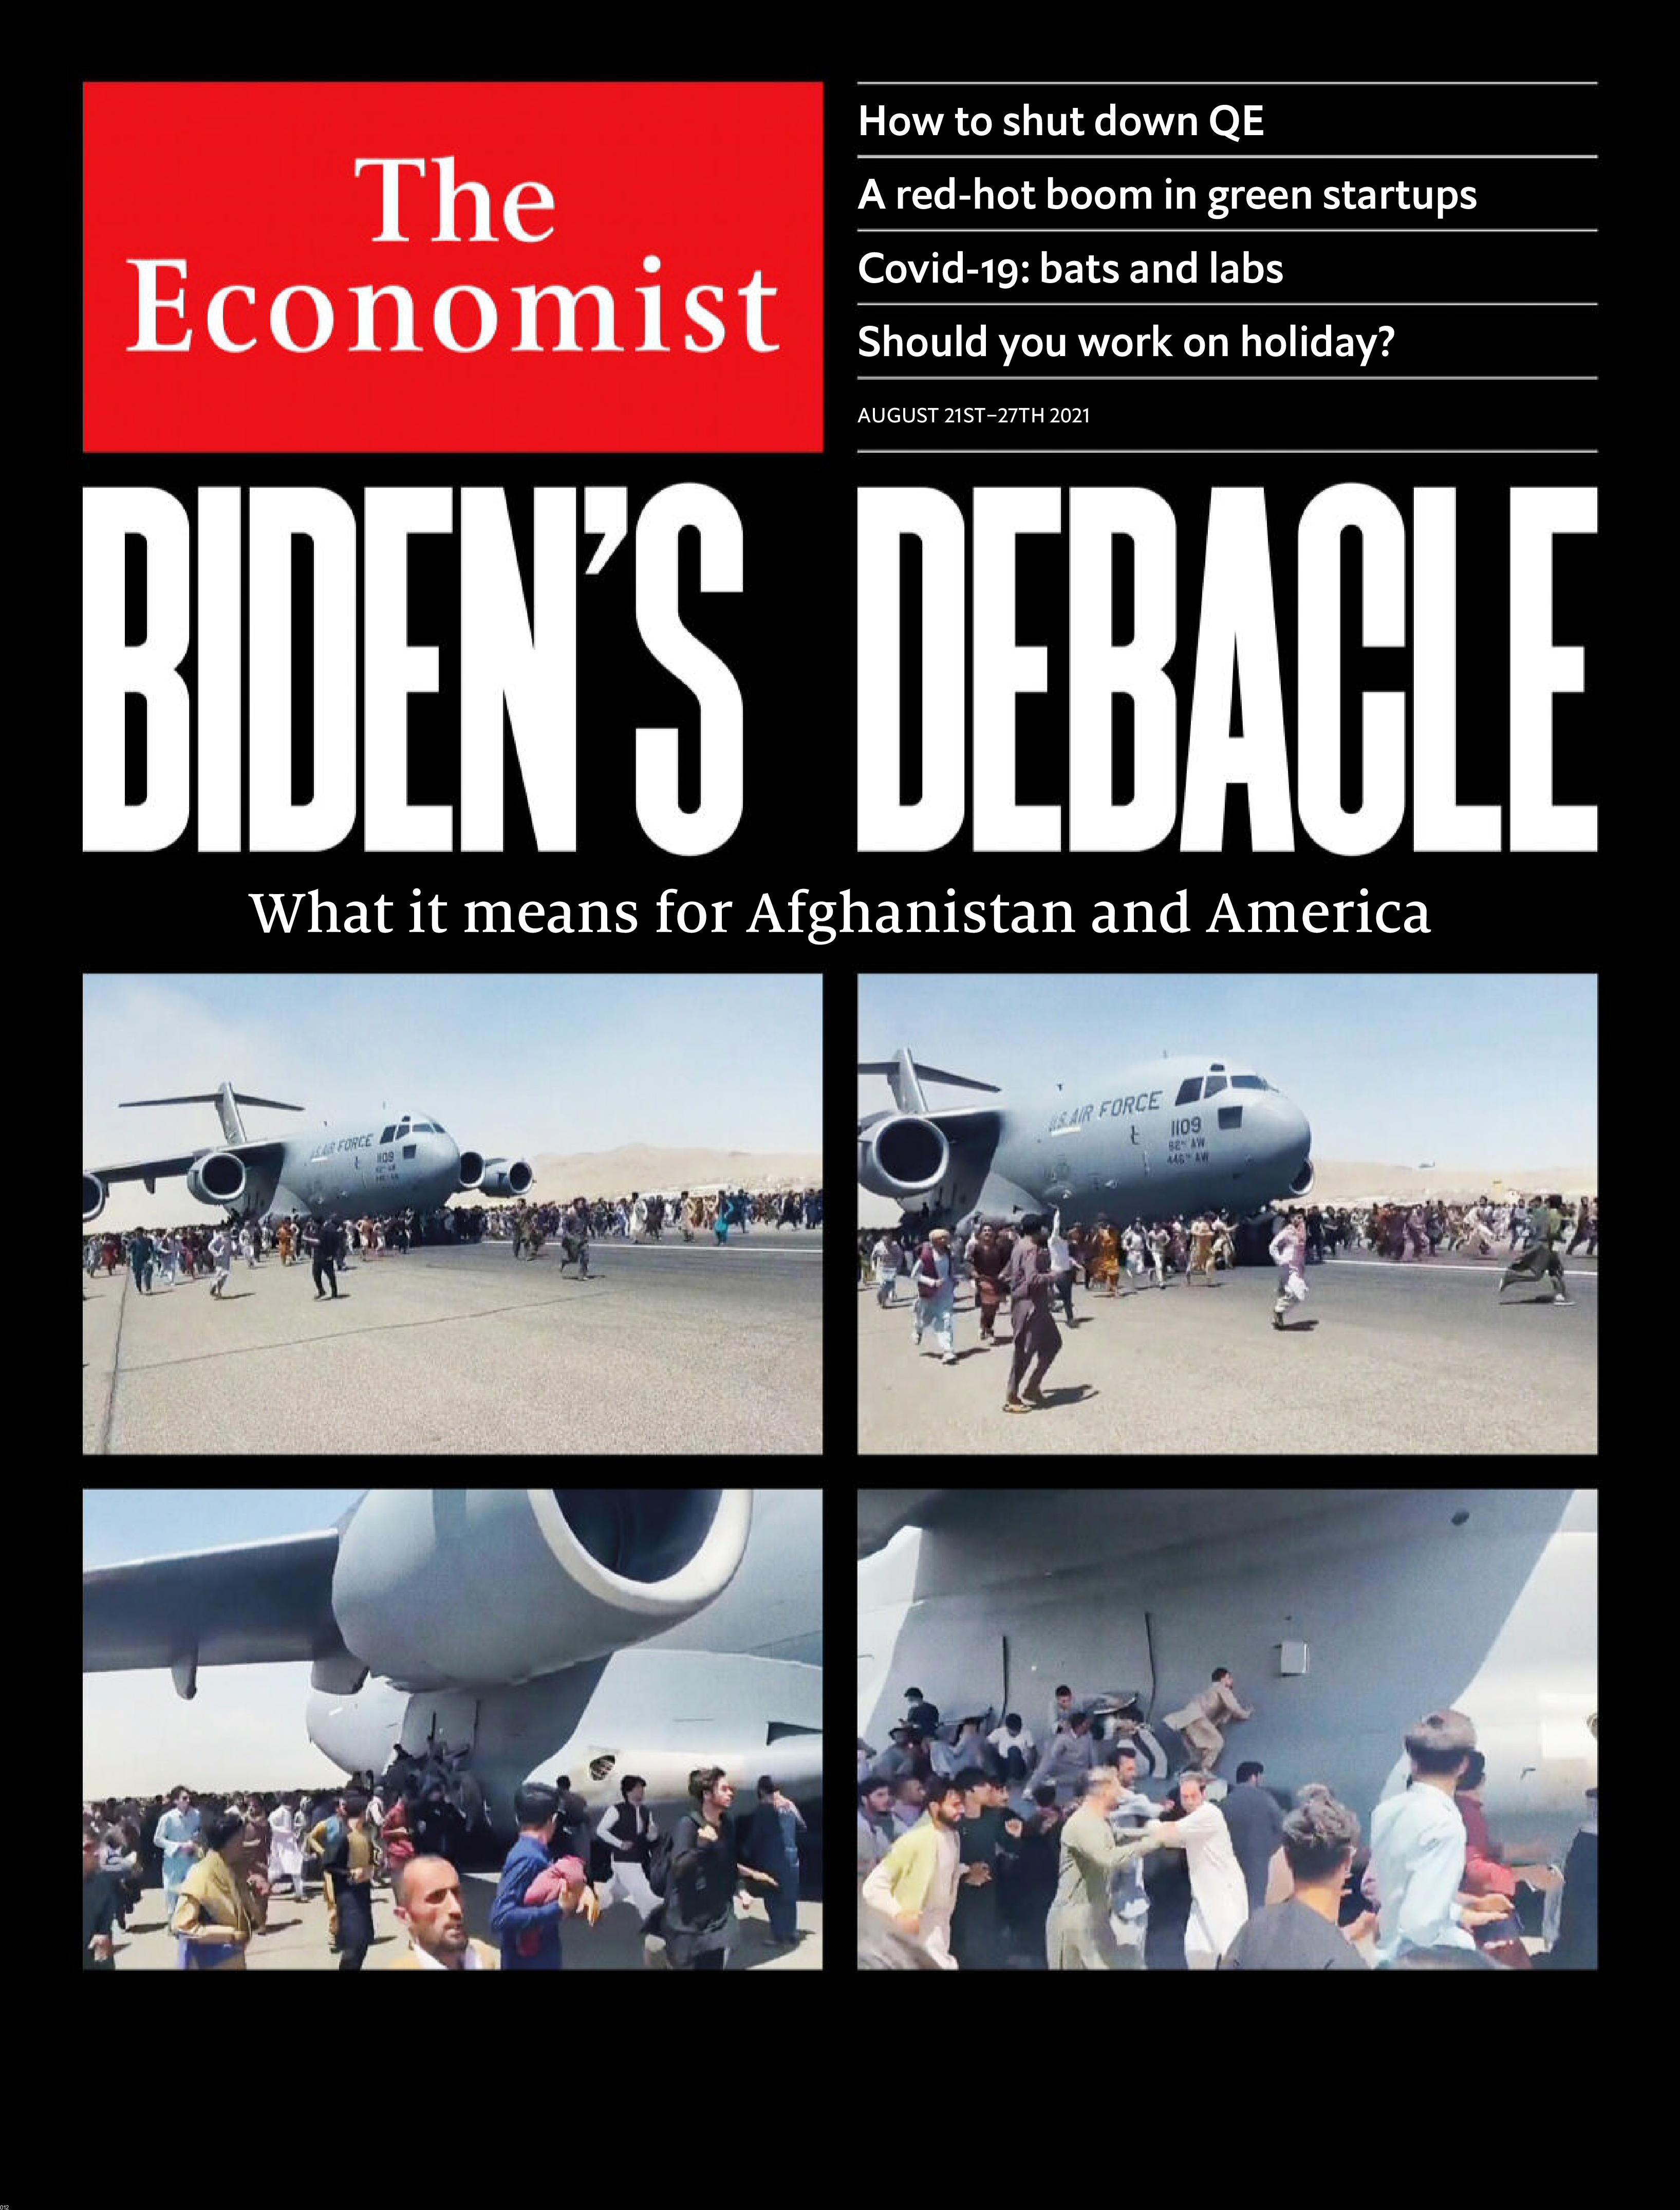 The Economist Asia Edition - August 21, 2021